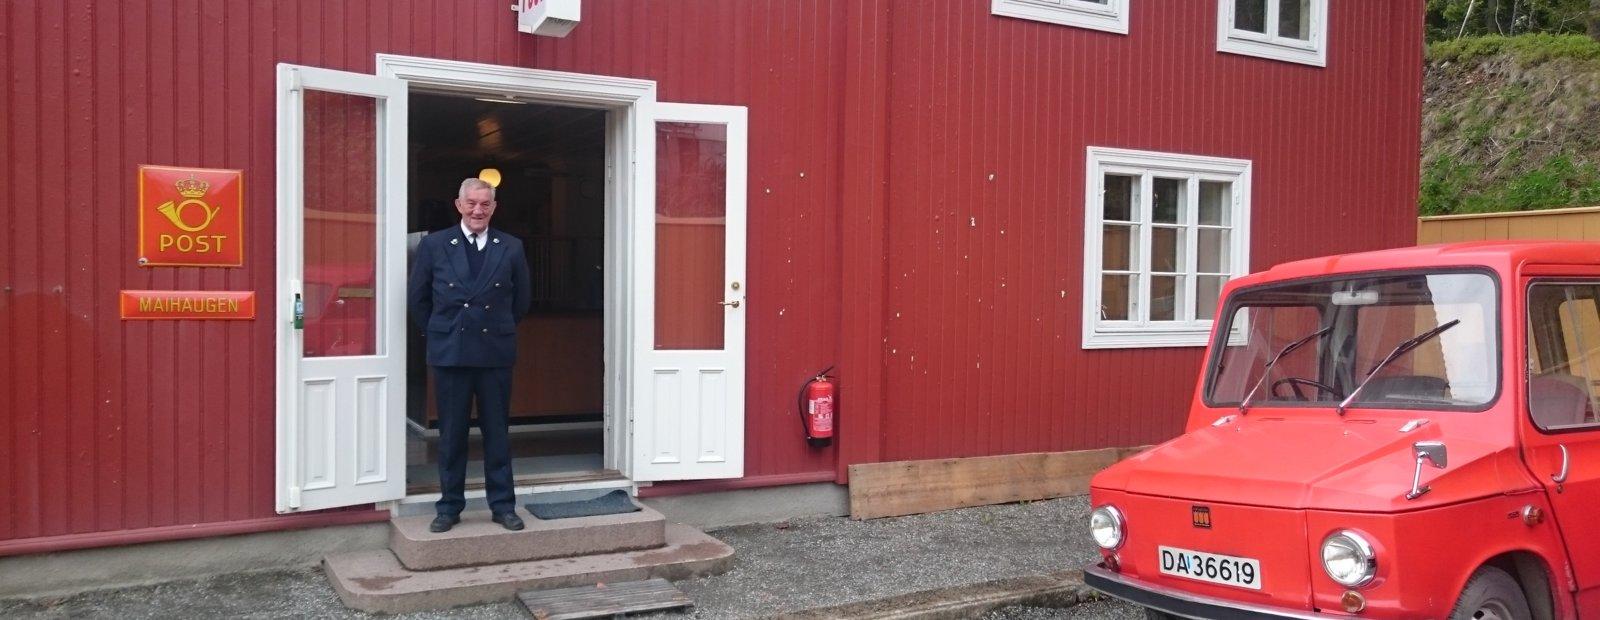 Norges Postmuseum, Maihaugen,